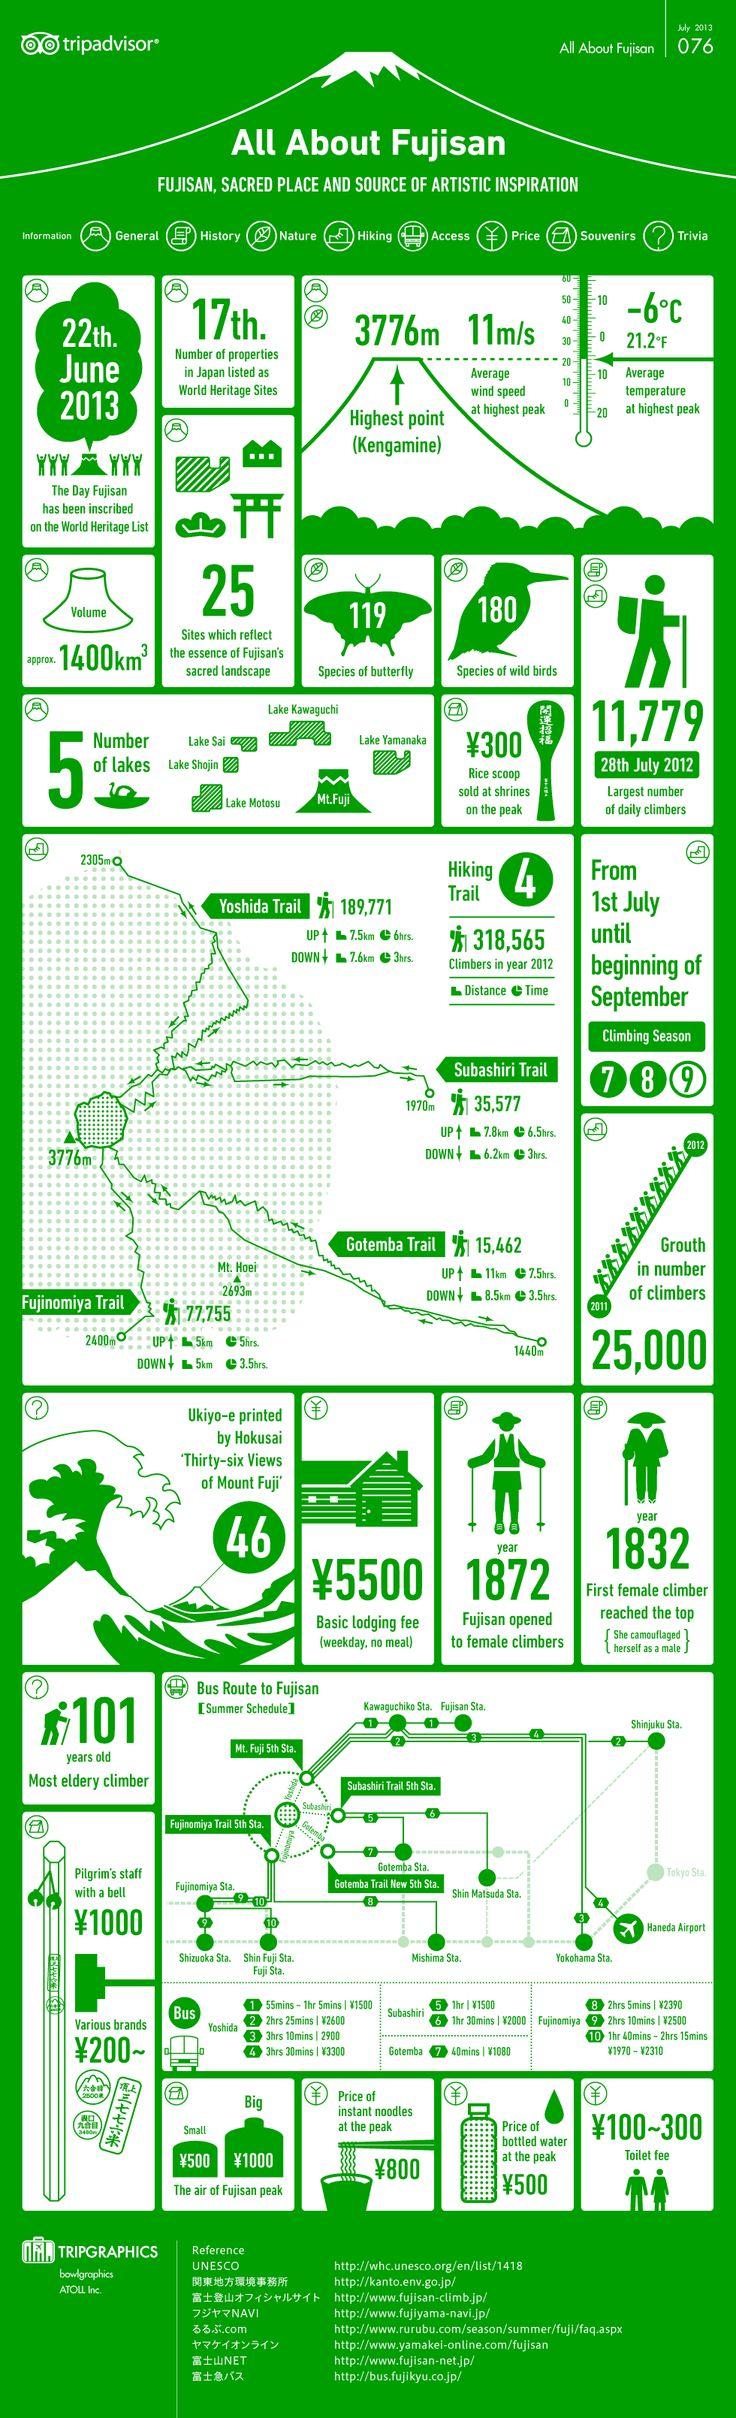 All about Fujisan (Mt. Fuji) : 旅をテーマにしたインフォグラフィックス - NAVER まとめ